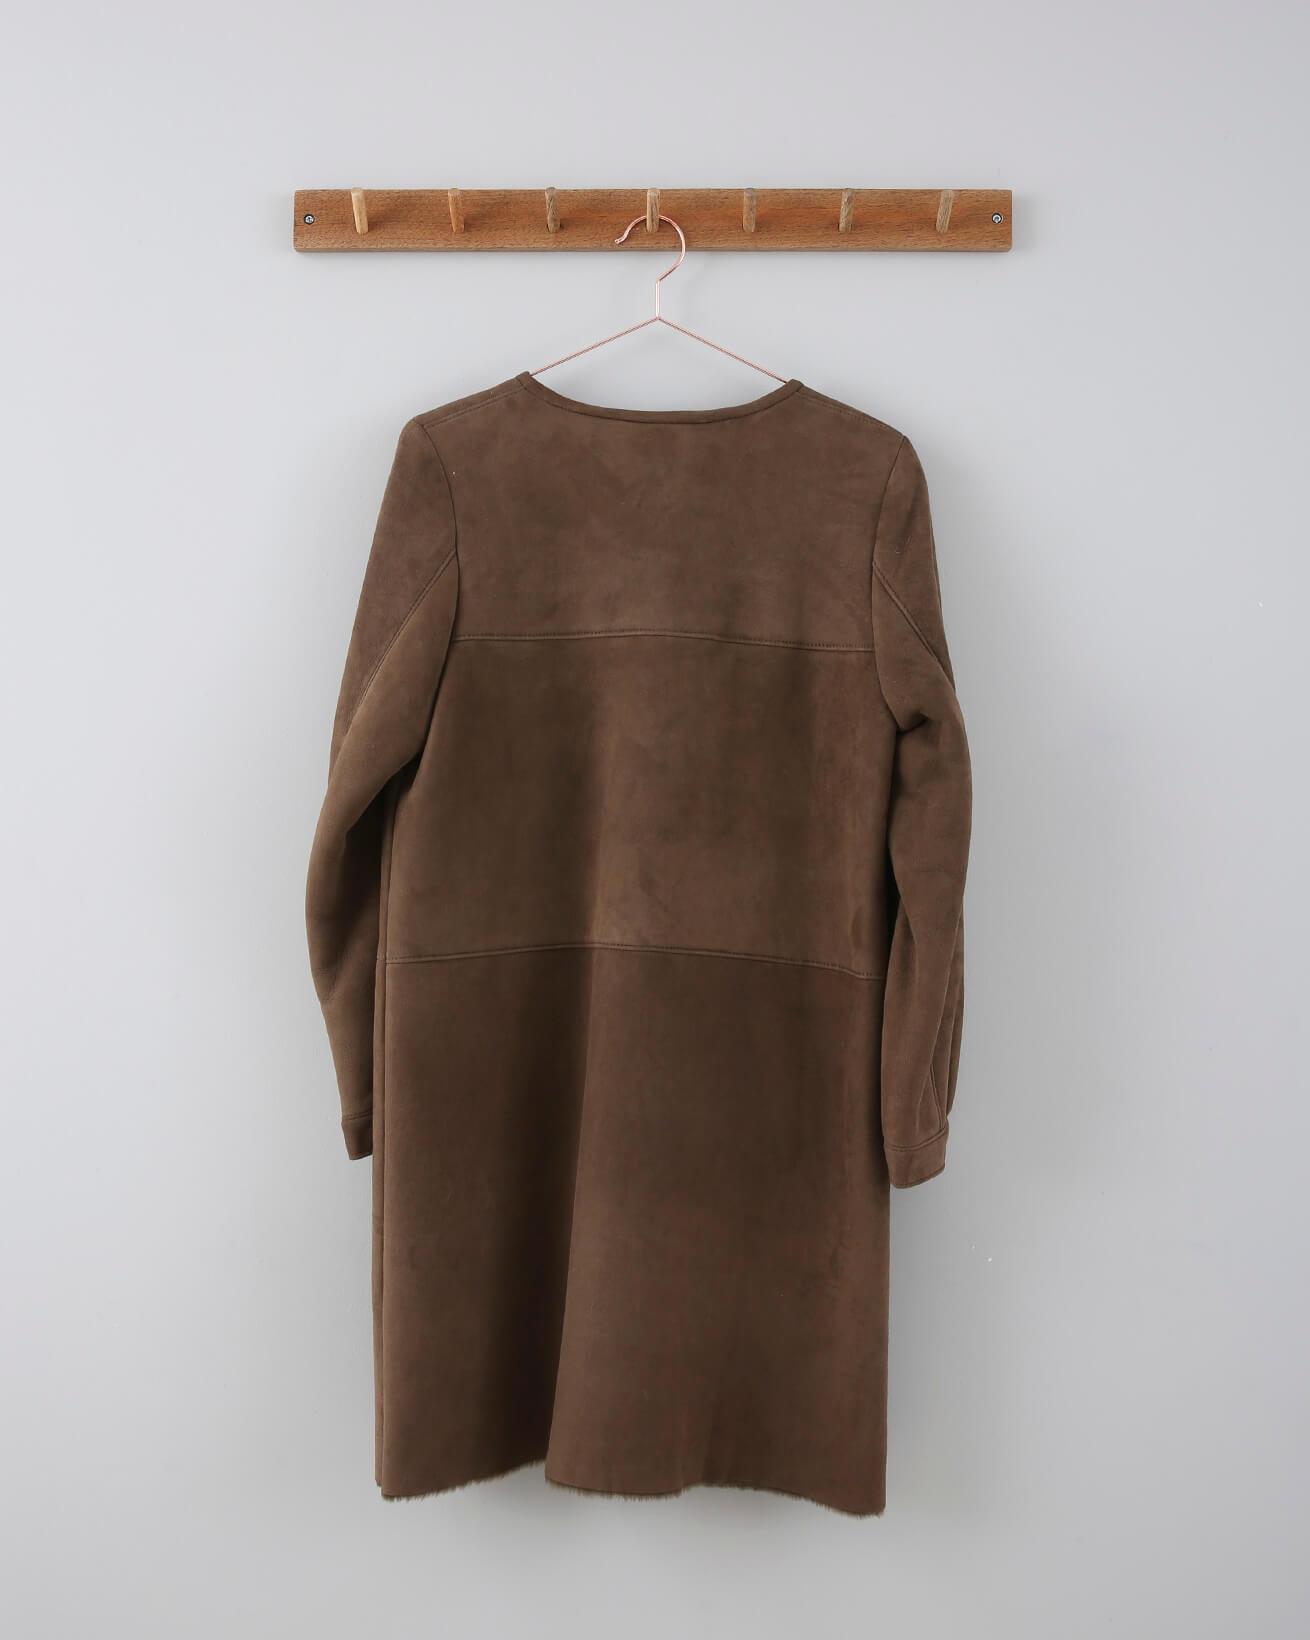 _0006_676-collarless sheepskin coat-coffee-back.jpg